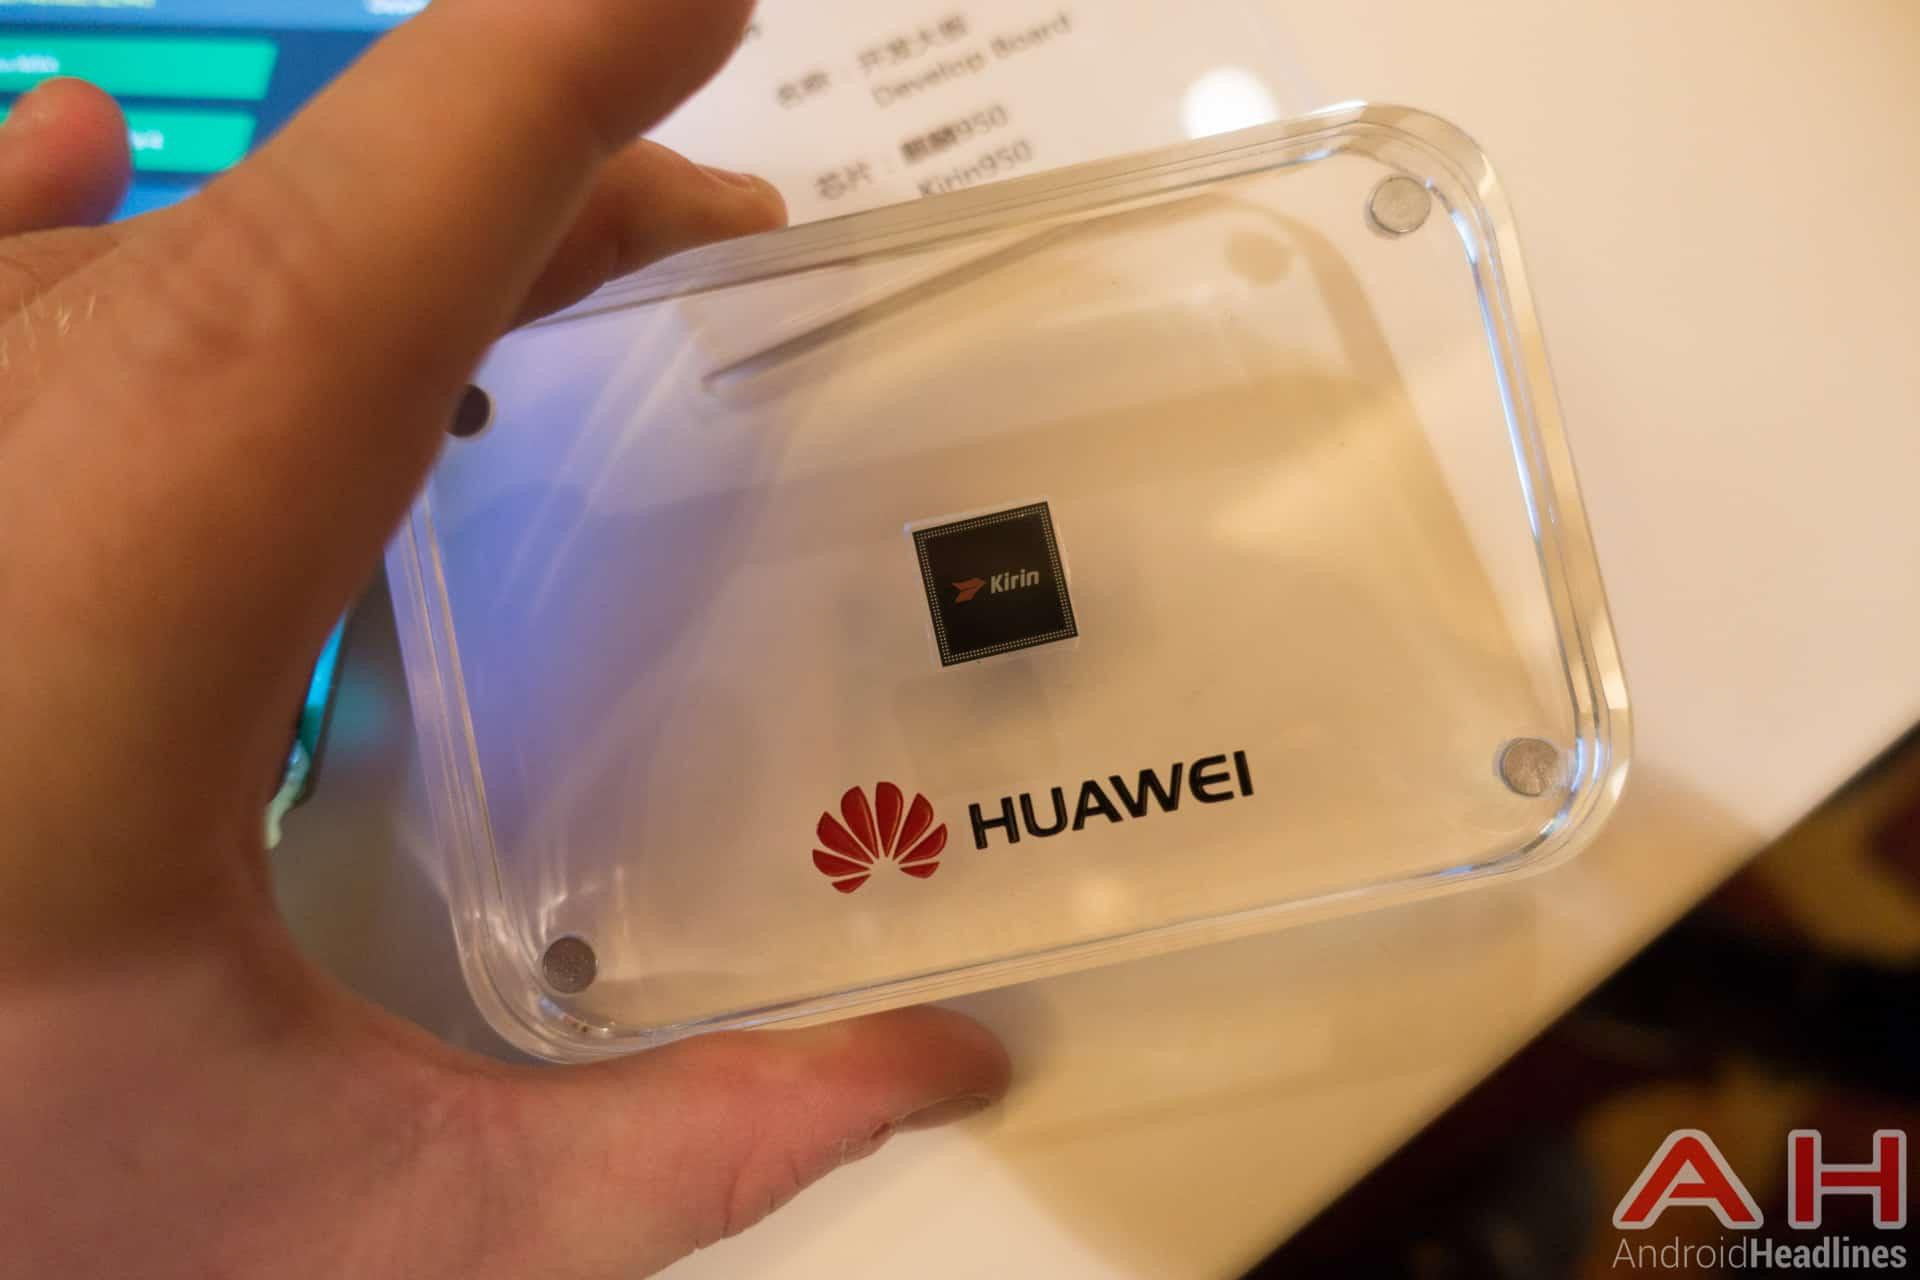 Huawei Kirin 950 AH 7